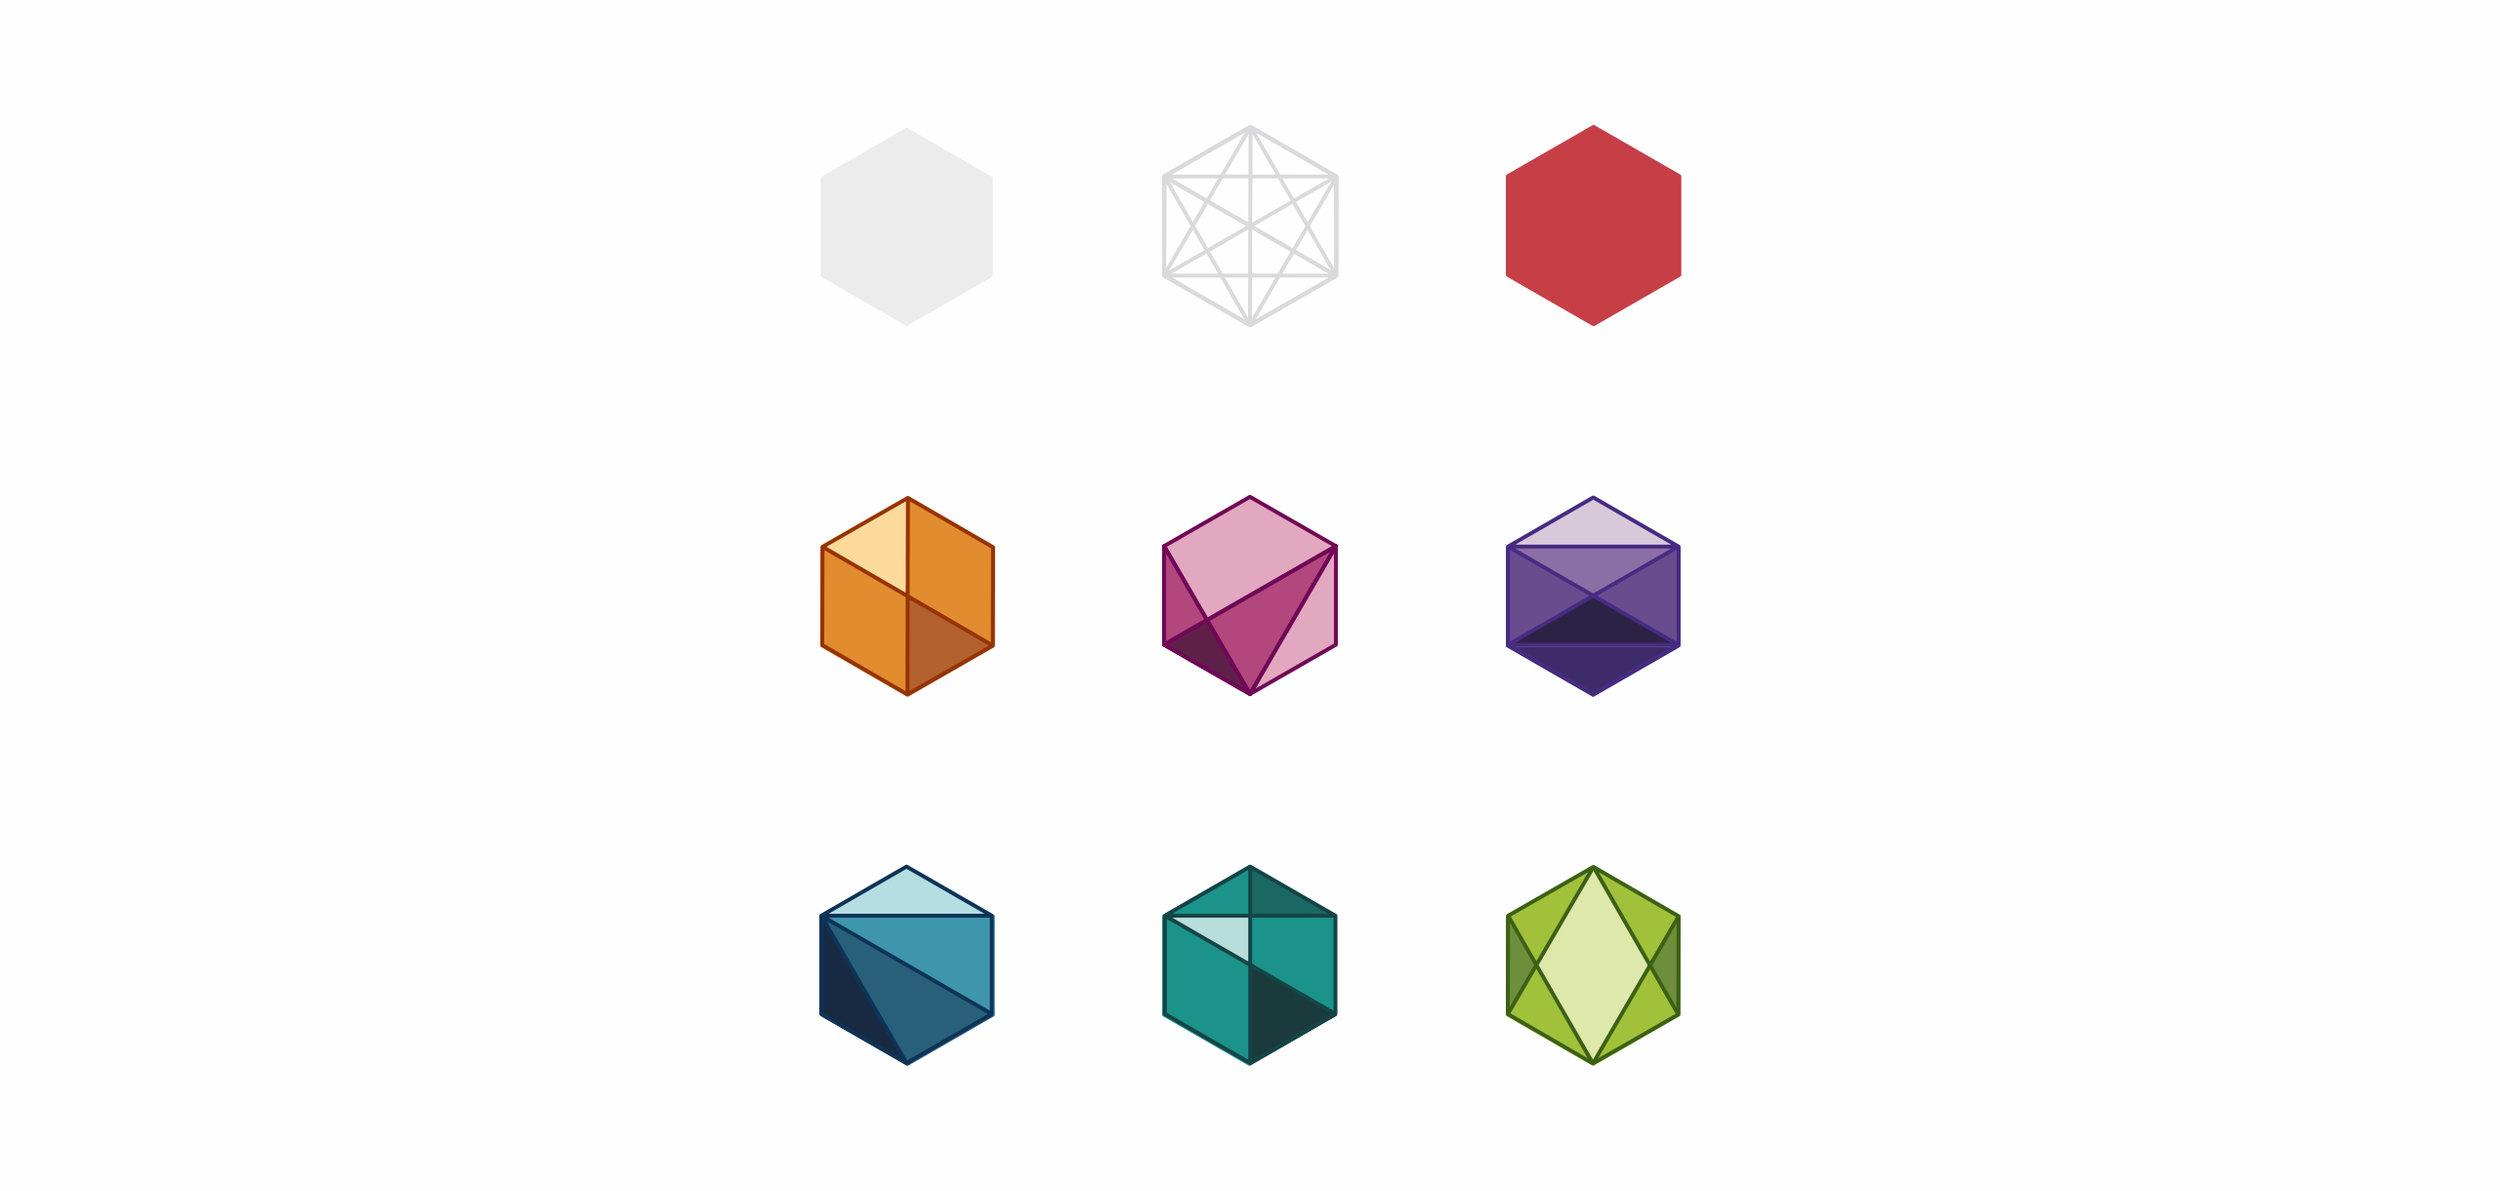 emds_brand-patterns-04@2x.jpg